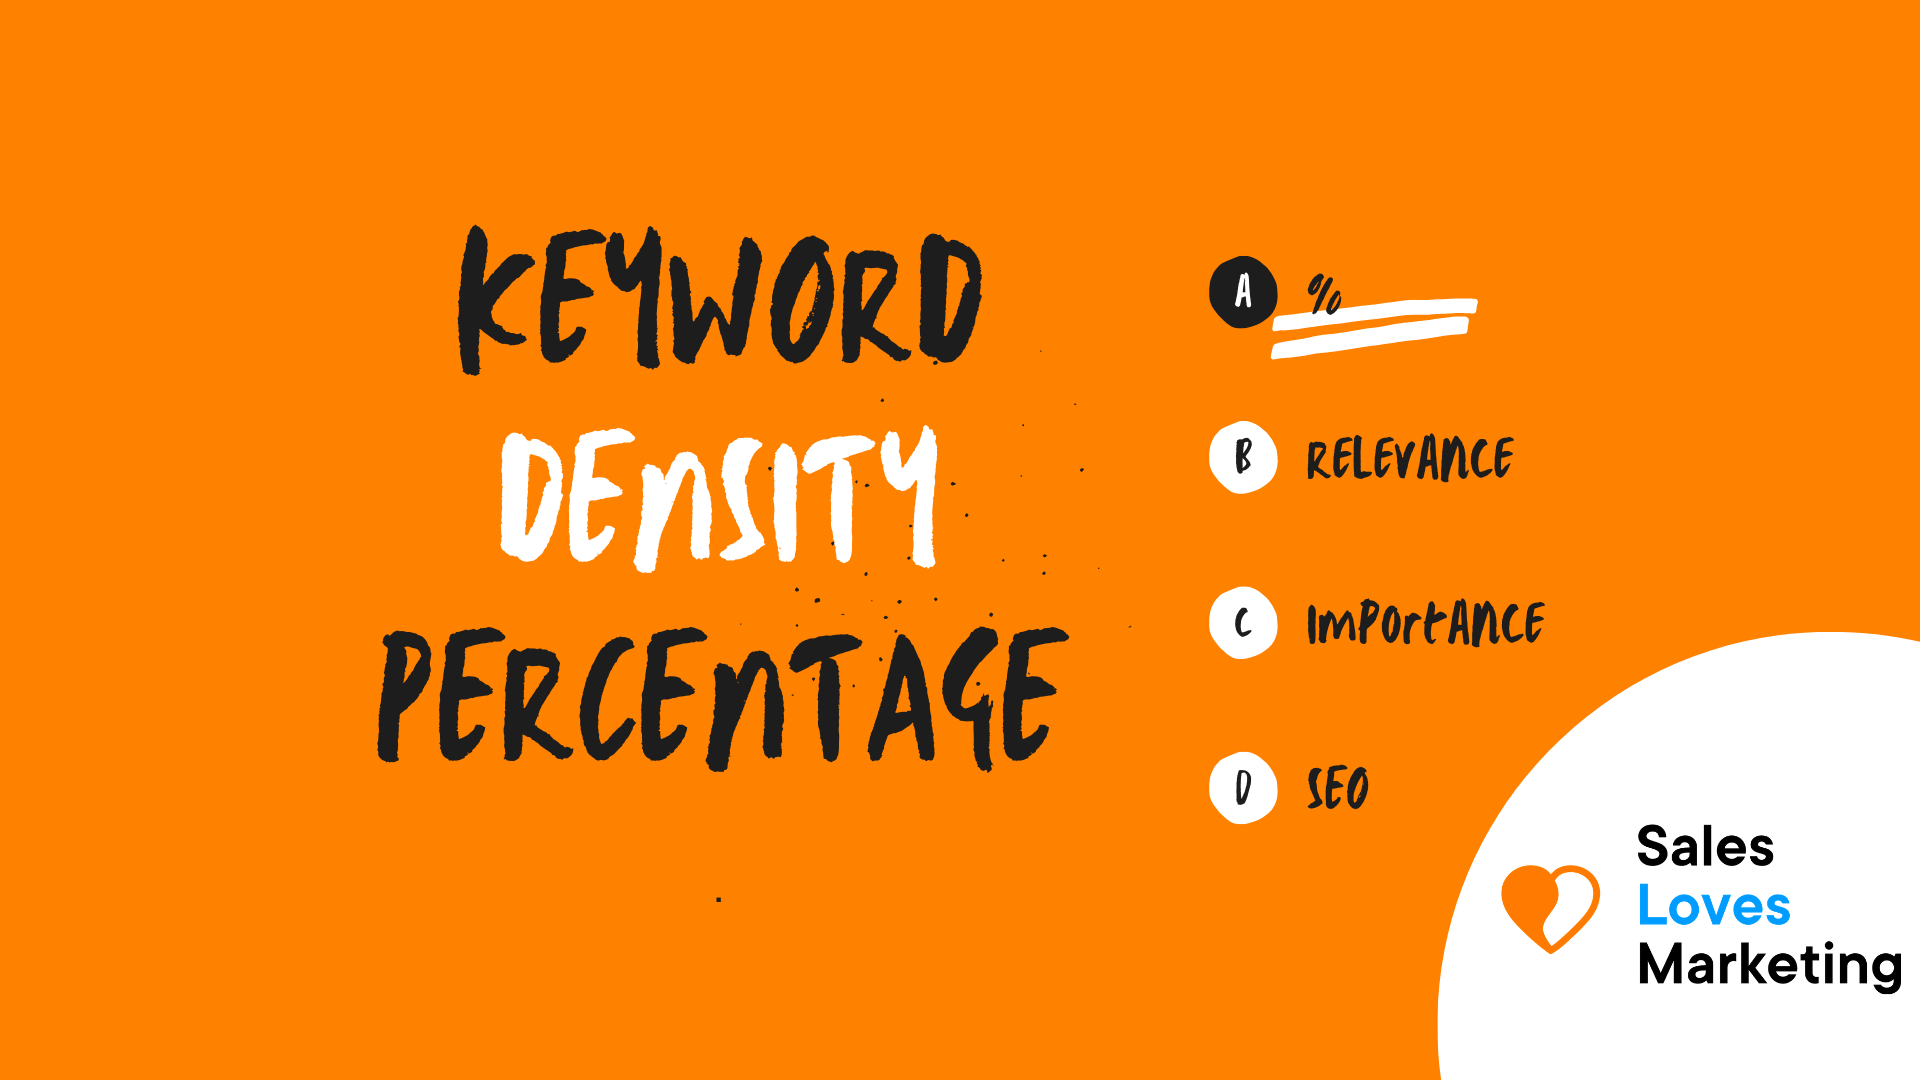 Keyword Density Percentage